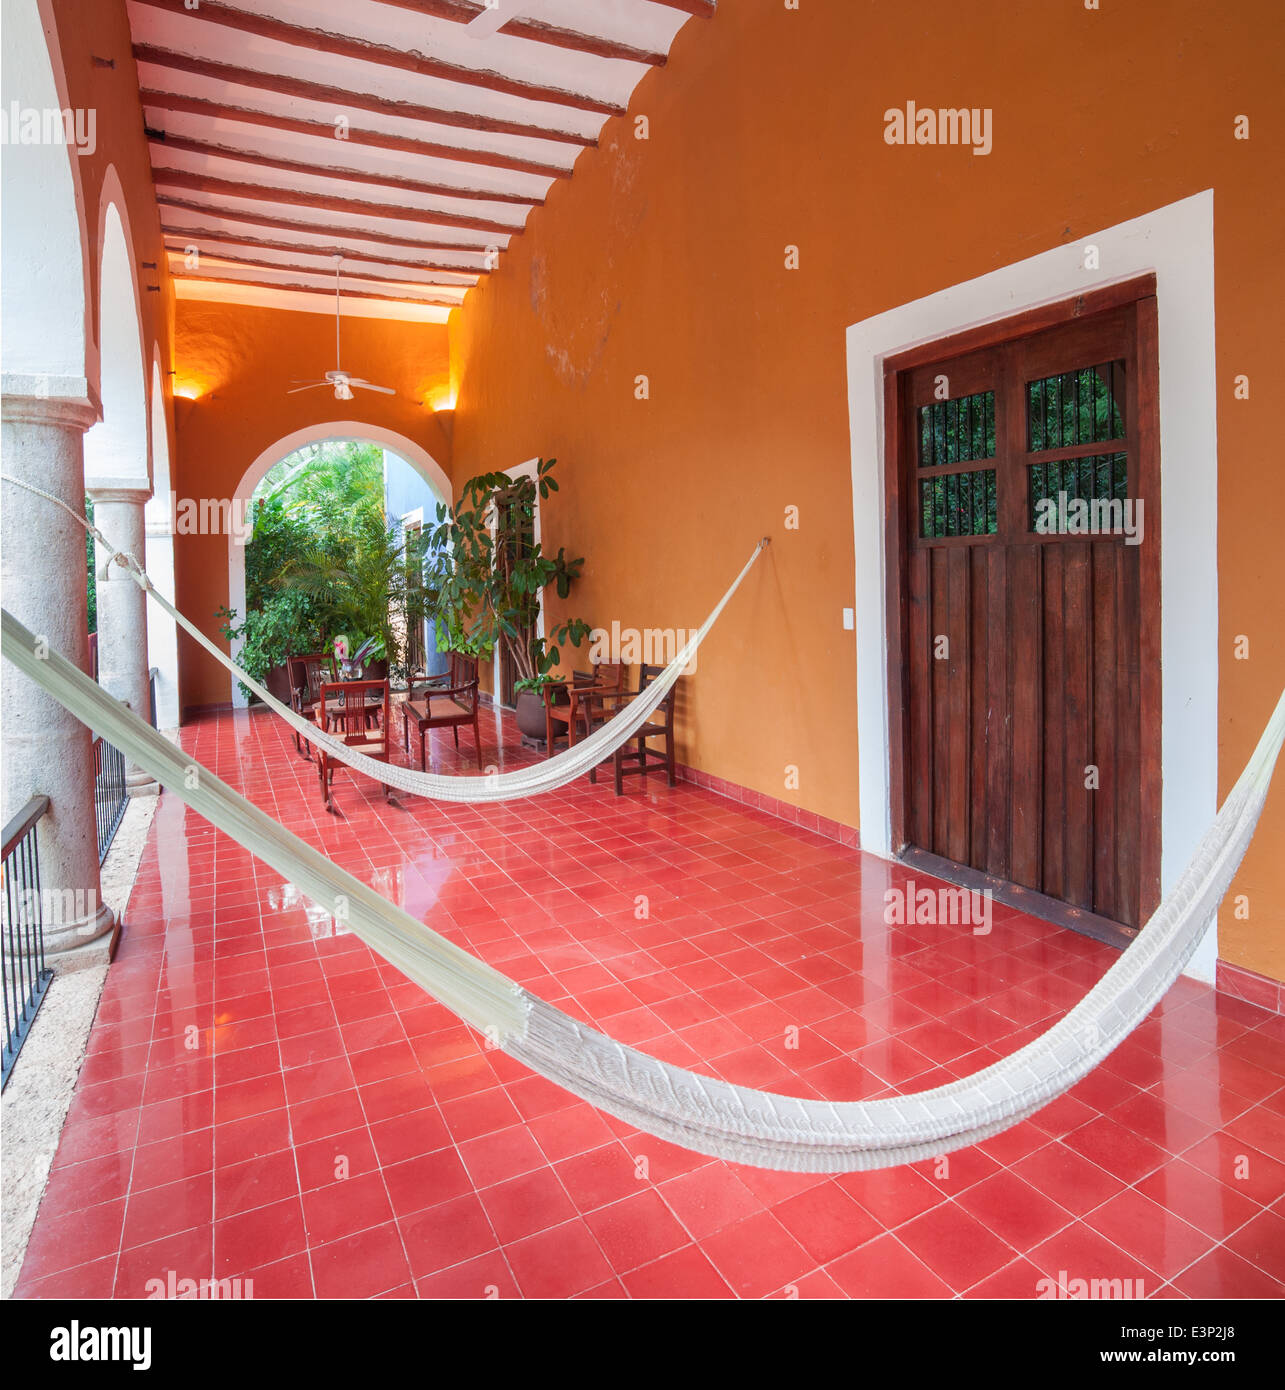 Hammocks hang in the patio of the San Jose Cholul hacienda in Yucatan, Mexico. - Stock Image